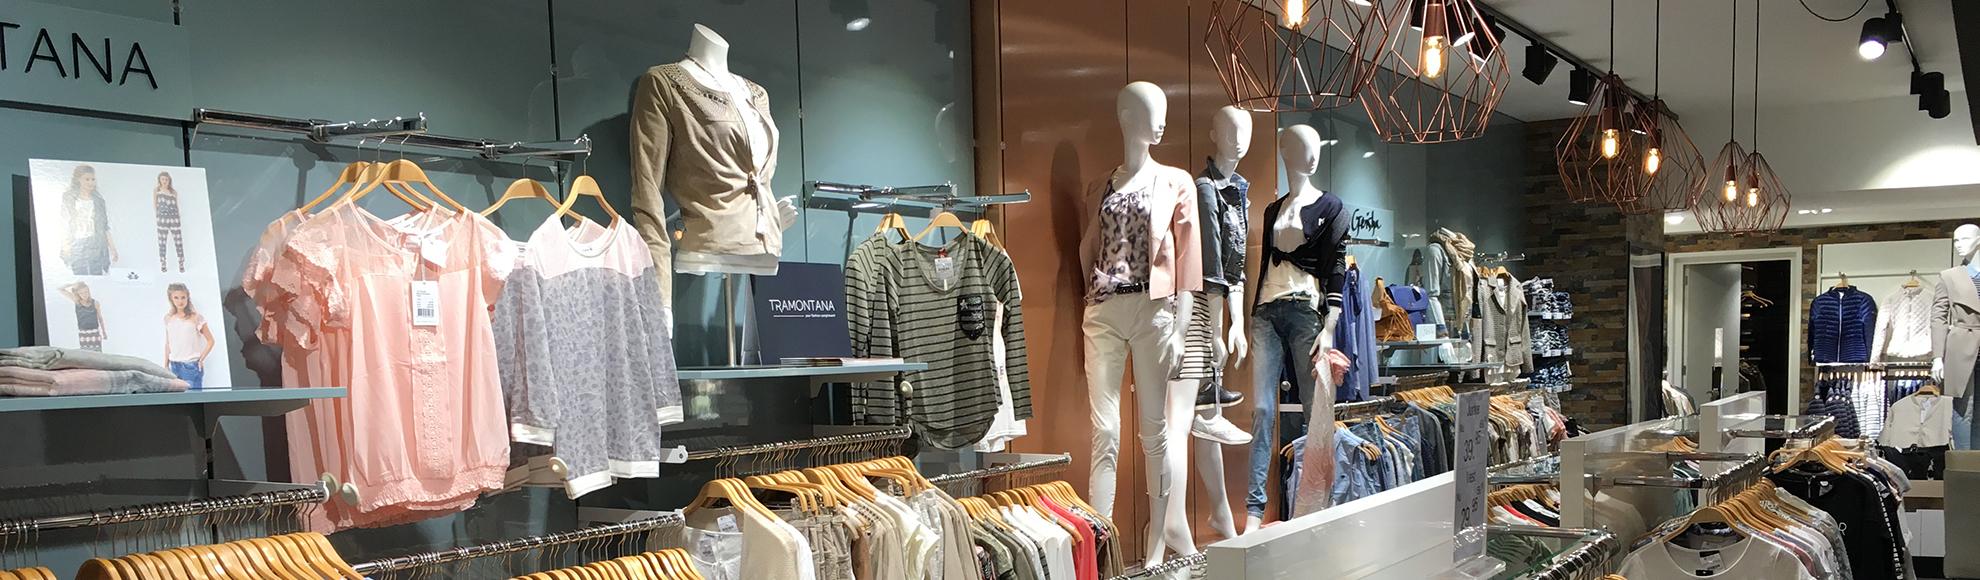 Vastgoed Stegeman modewinkel Nijverdal Unique